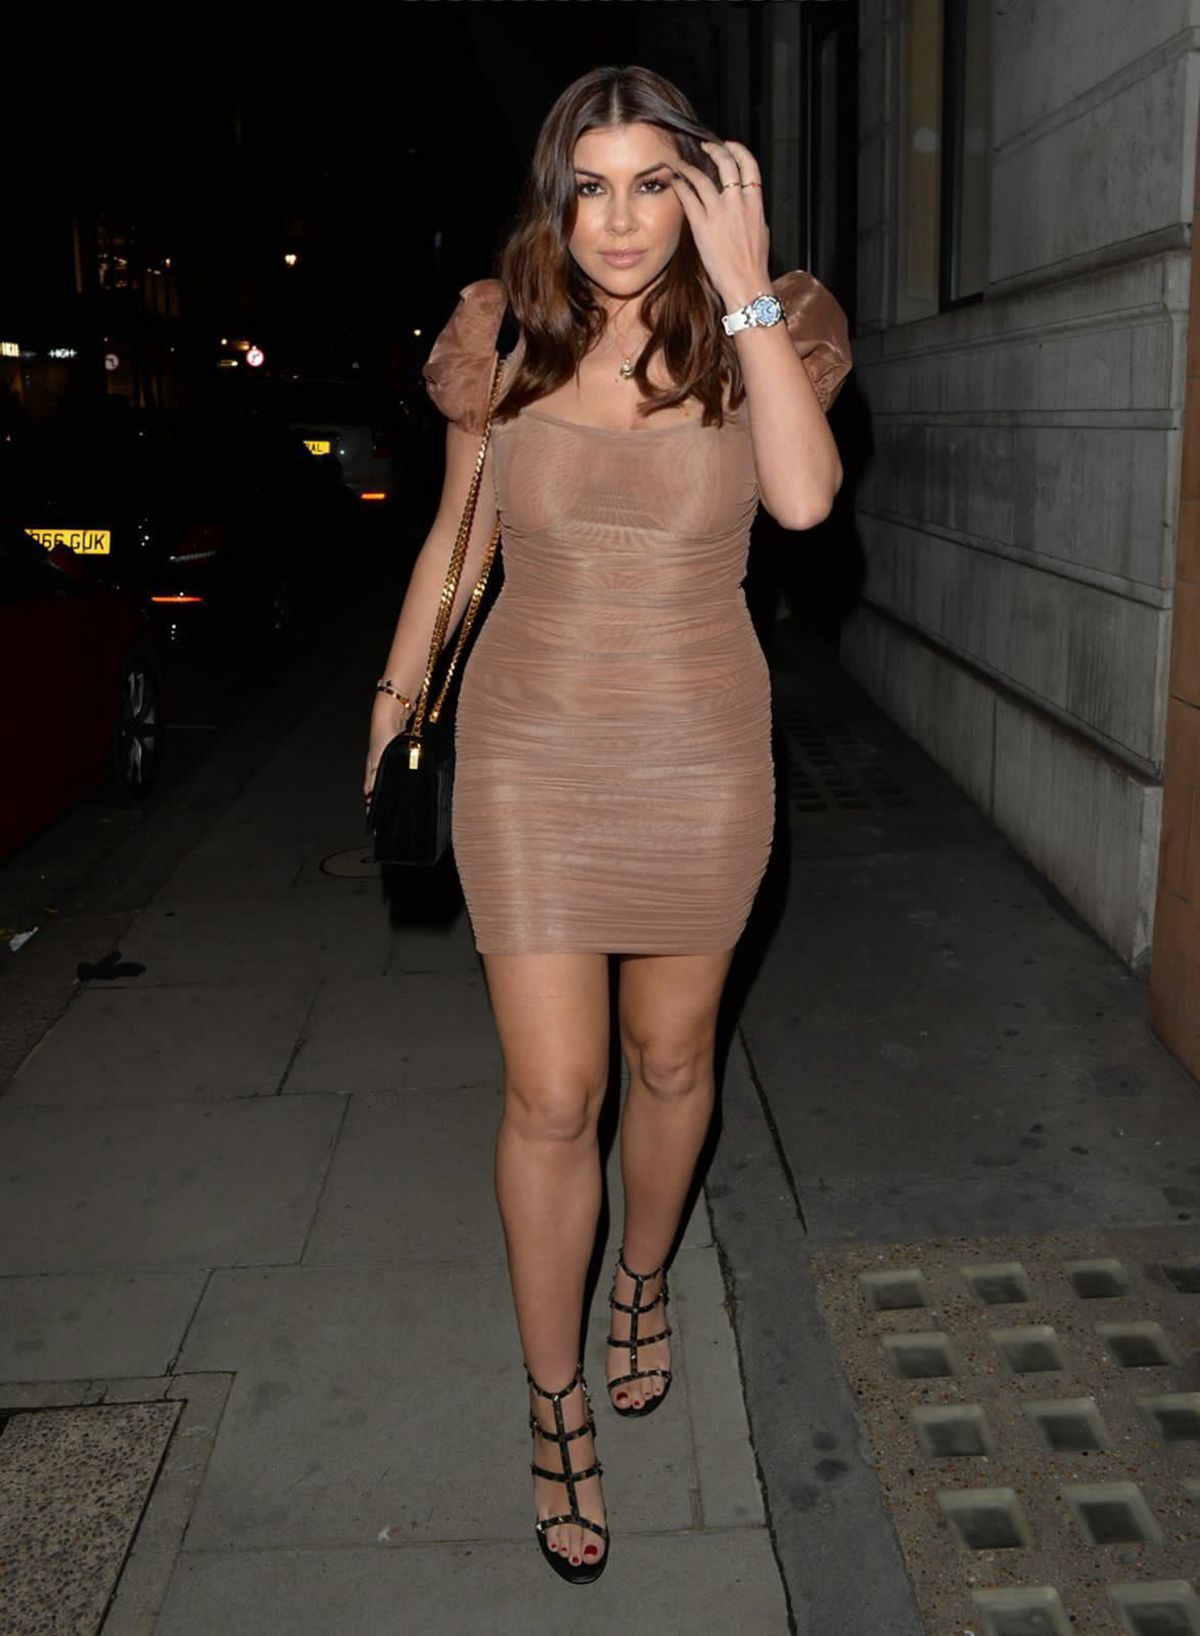 IMOGEN THOMAS in a Tight Dress at Bagatelle in London 12/06/2020 –  HawtCelebs